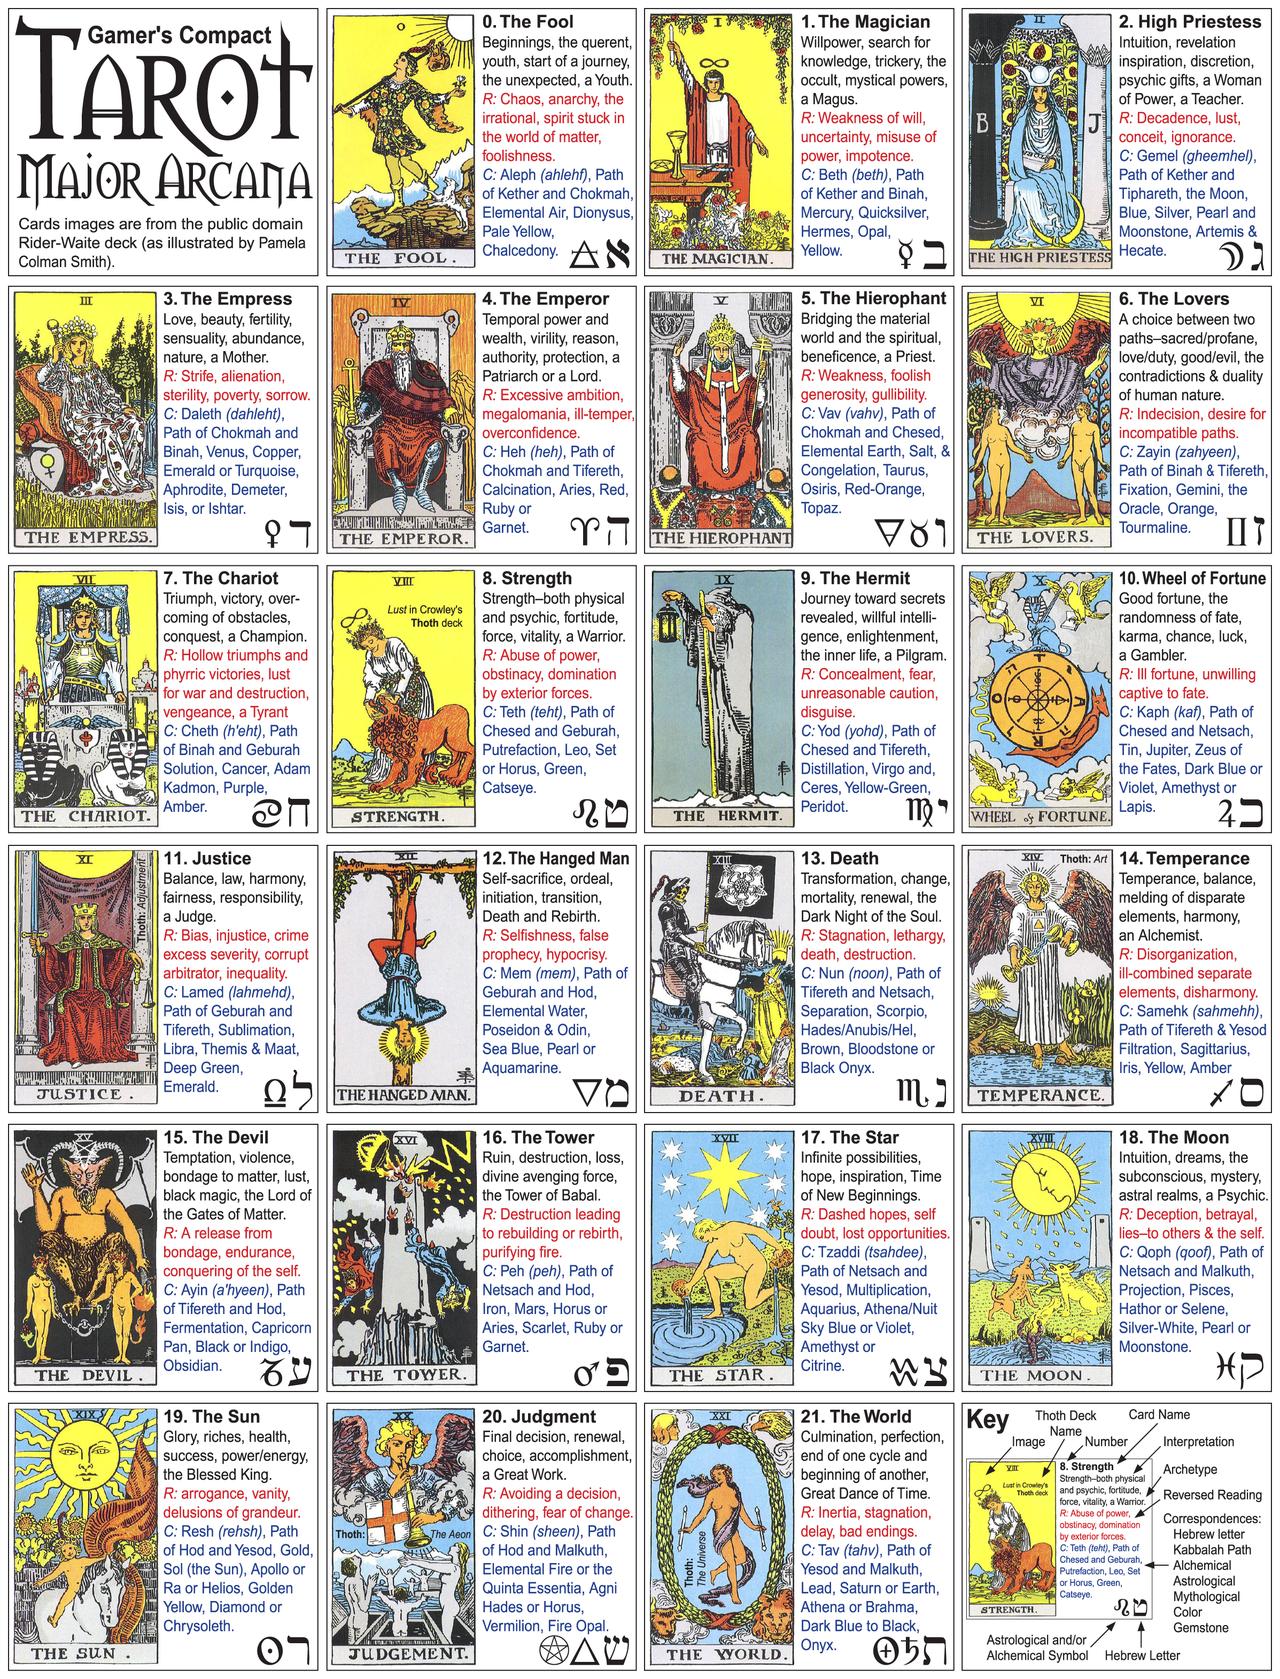 Gamers Compact Major Arcana In 2021 Tarot Cards Art Tarot Cards Major Arcana Tarot Card Meanings